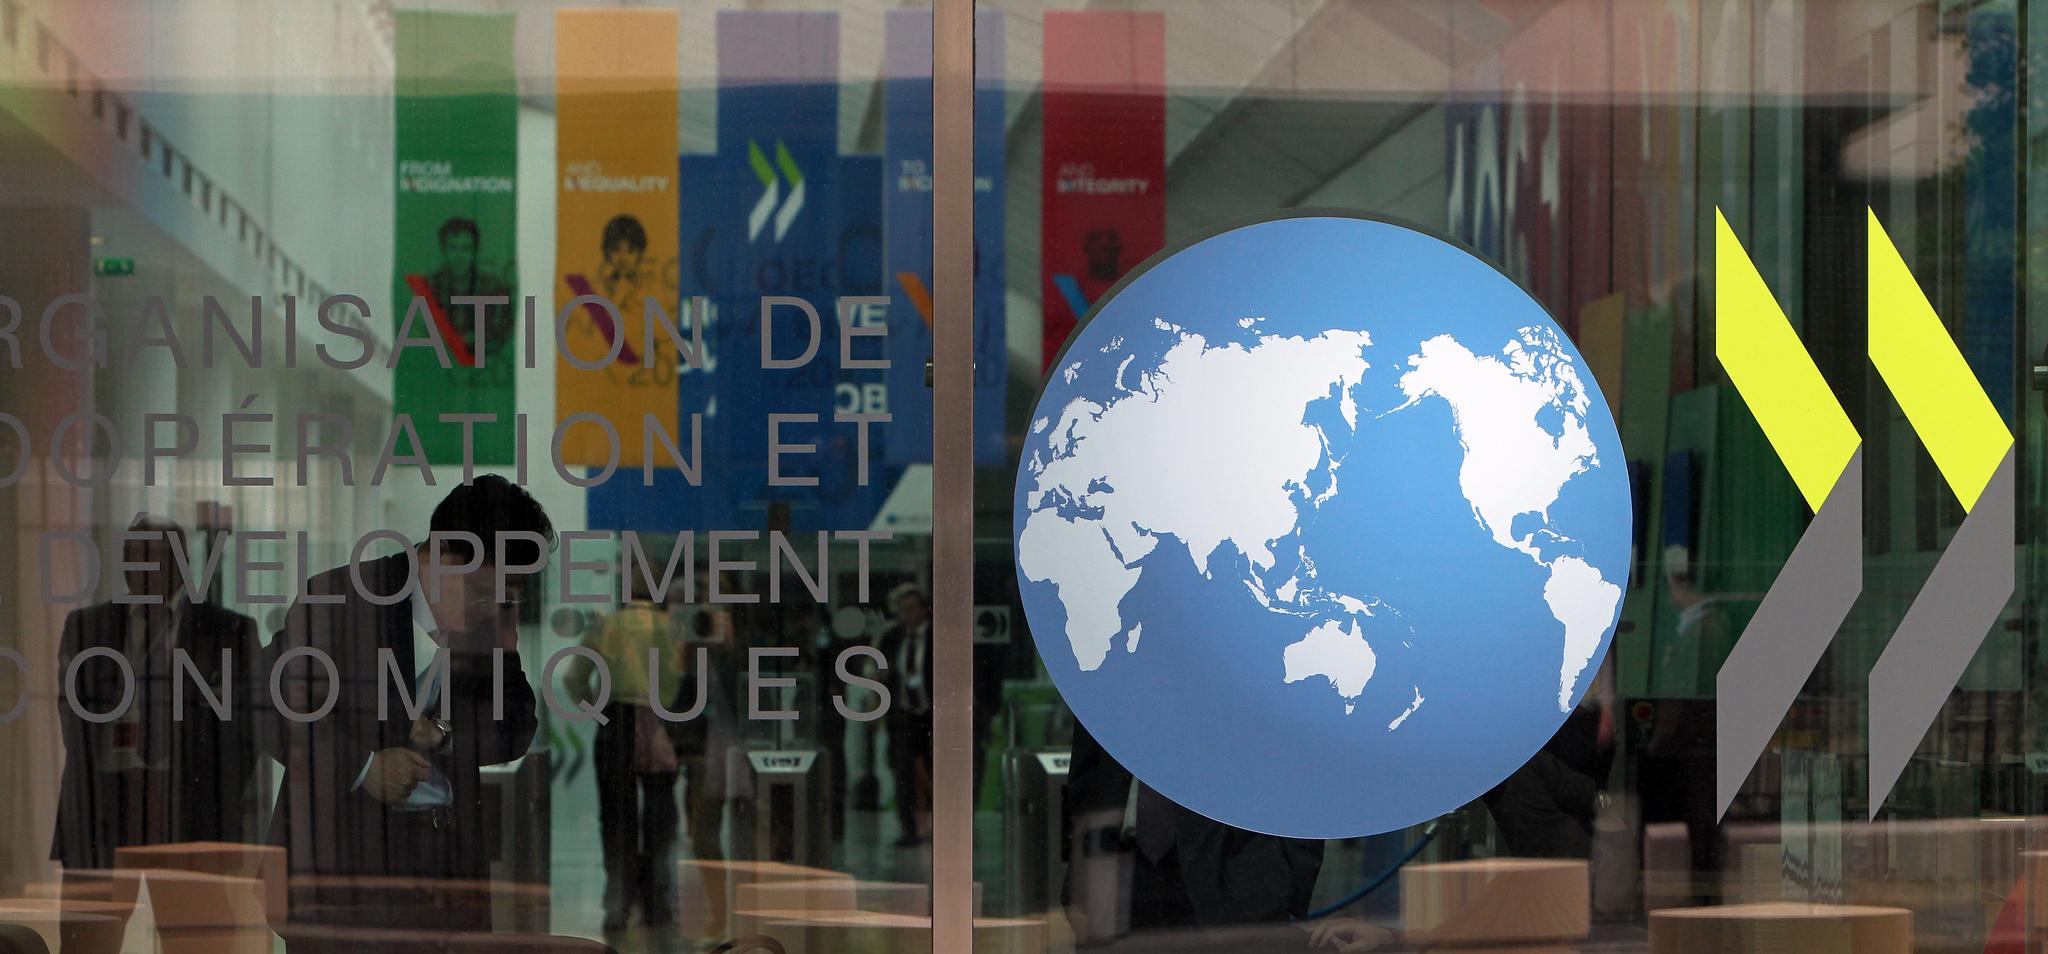 June-25-OECD-7249712402_f97eb25a59_k